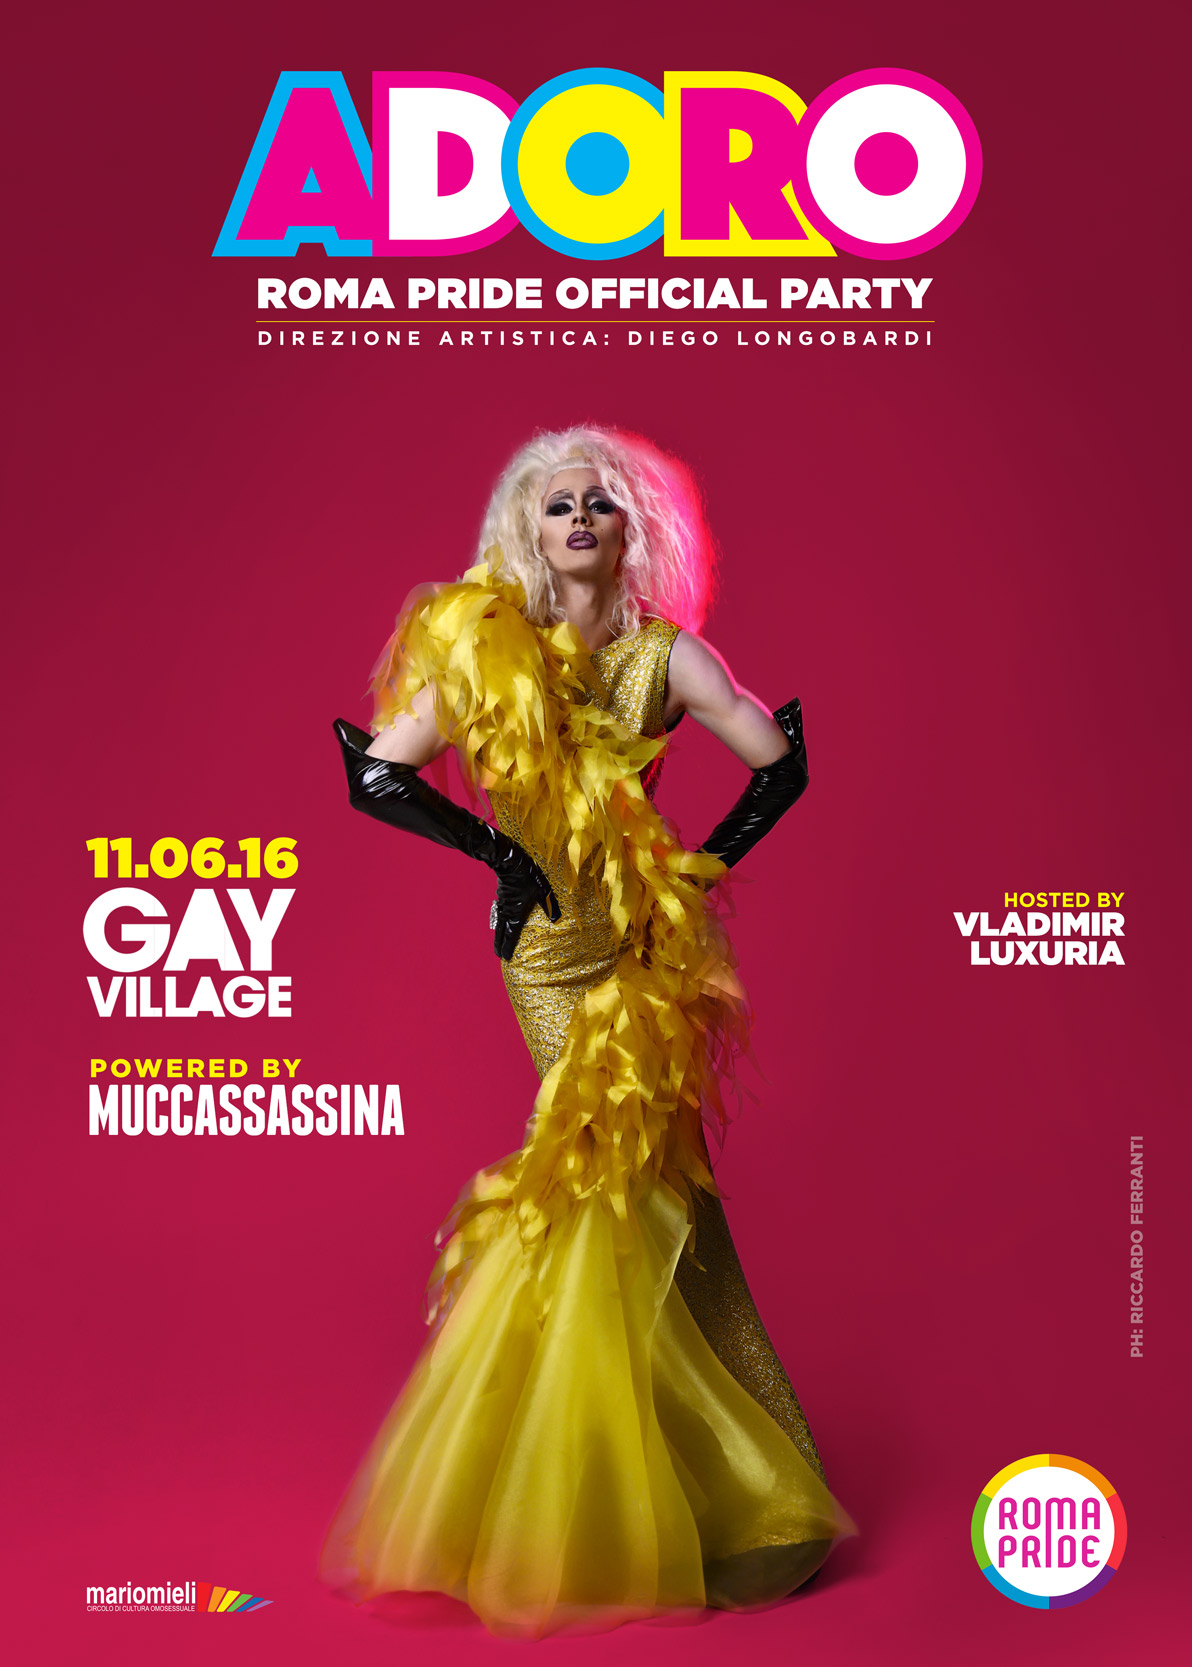 Adoro - Roma Pride Official Party